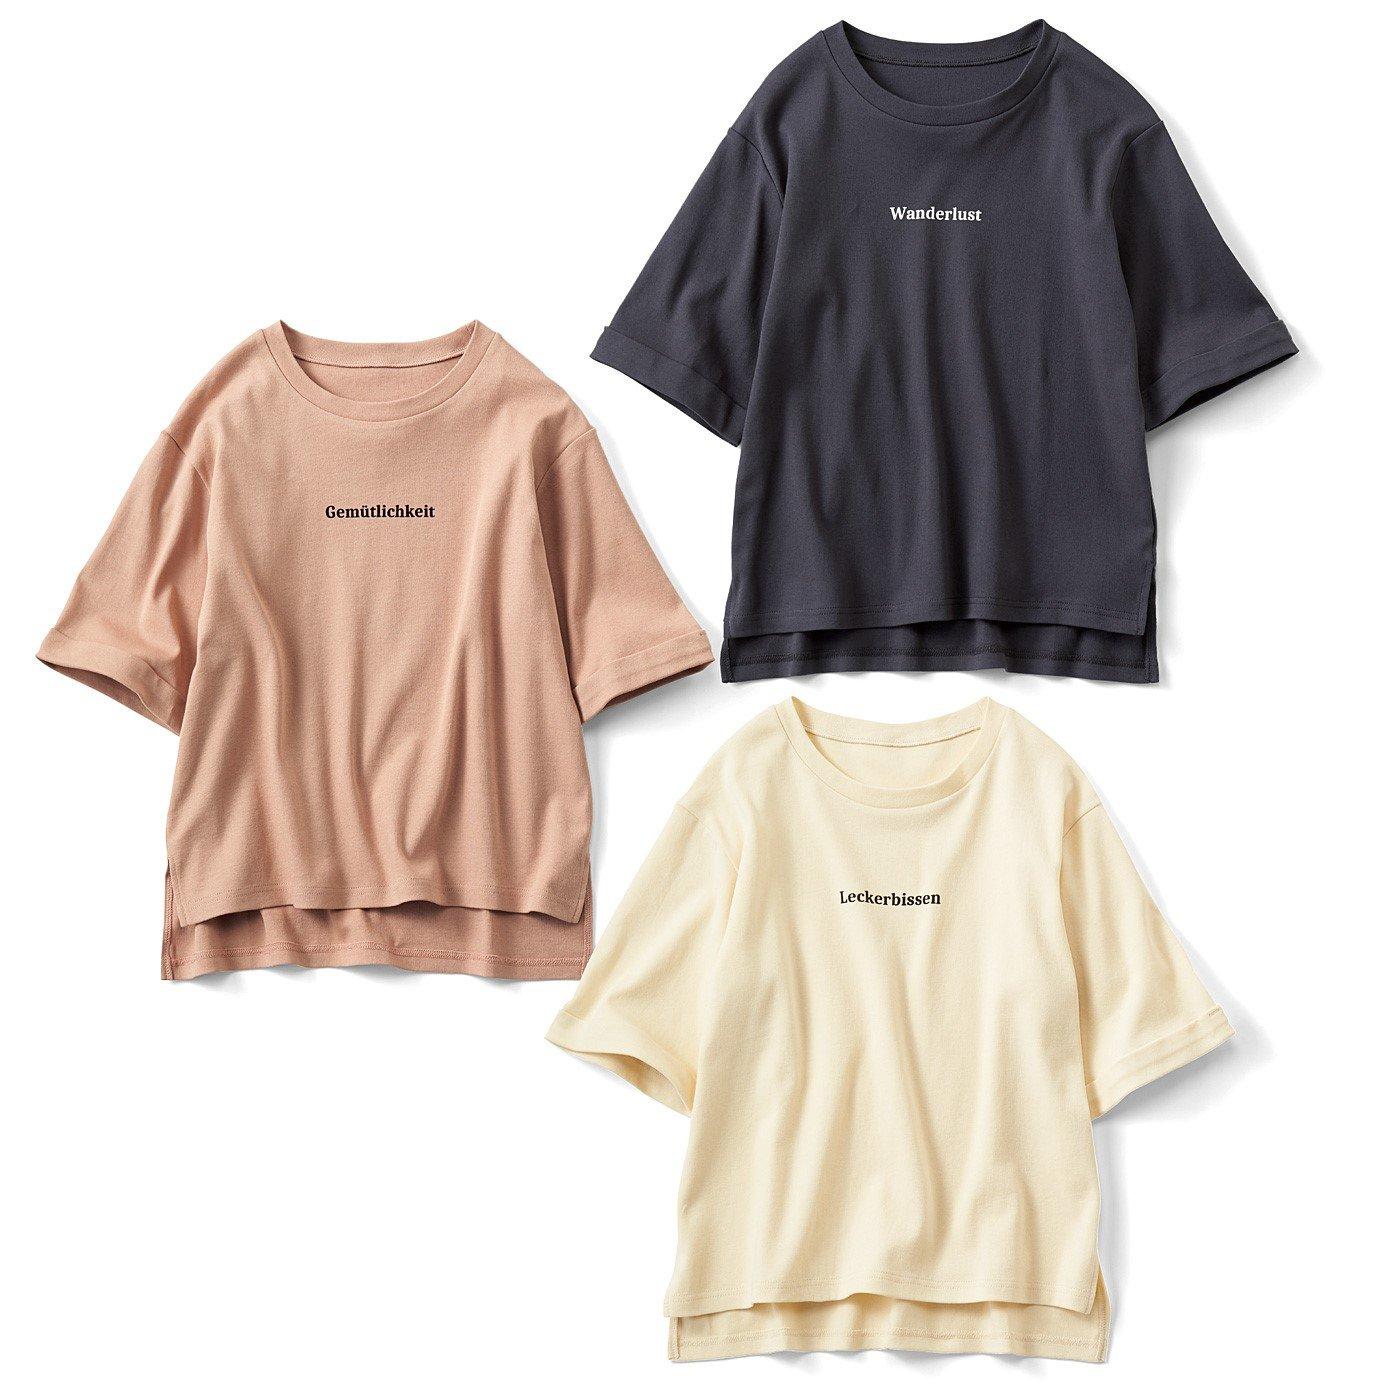 Live in comfort コットン100% さらっとした肌ざわりの五分袖ロゴTシャツの会(3回エントリー)